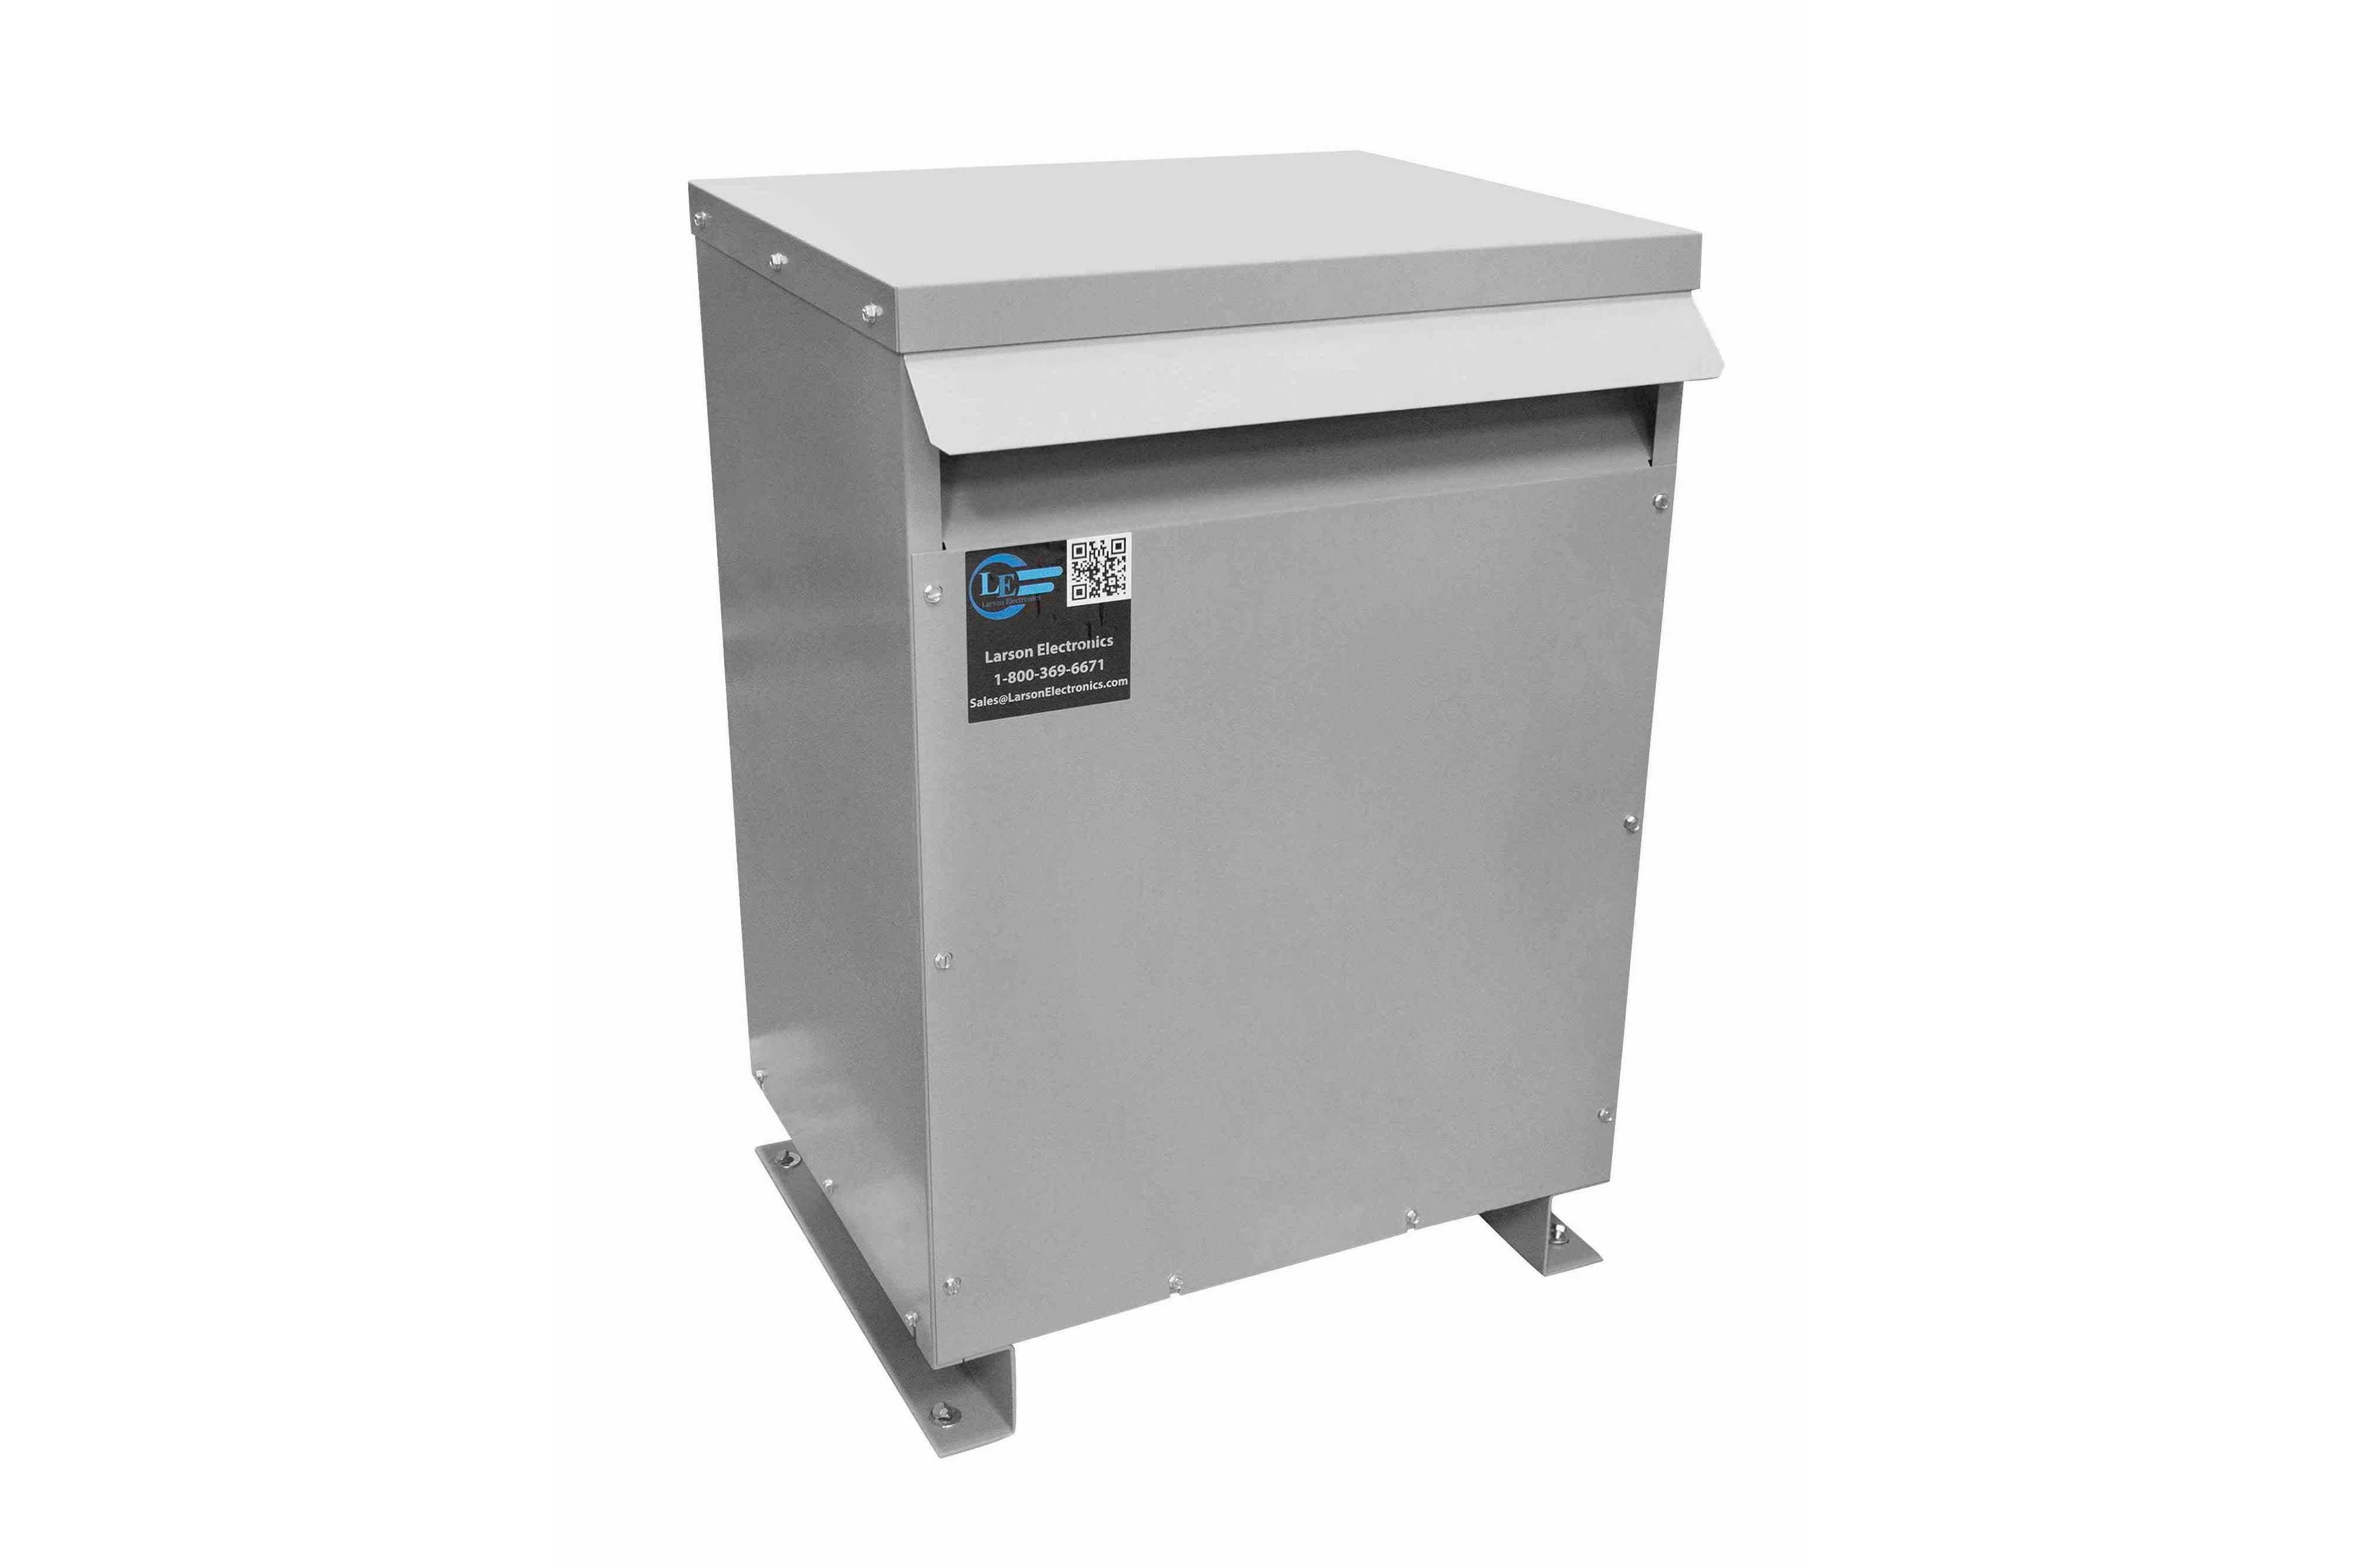 400 kVA 3PH DOE Transformer, 208V Delta Primary, 415Y/240 Wye-N Secondary, N3R, Ventilated, 60 Hz